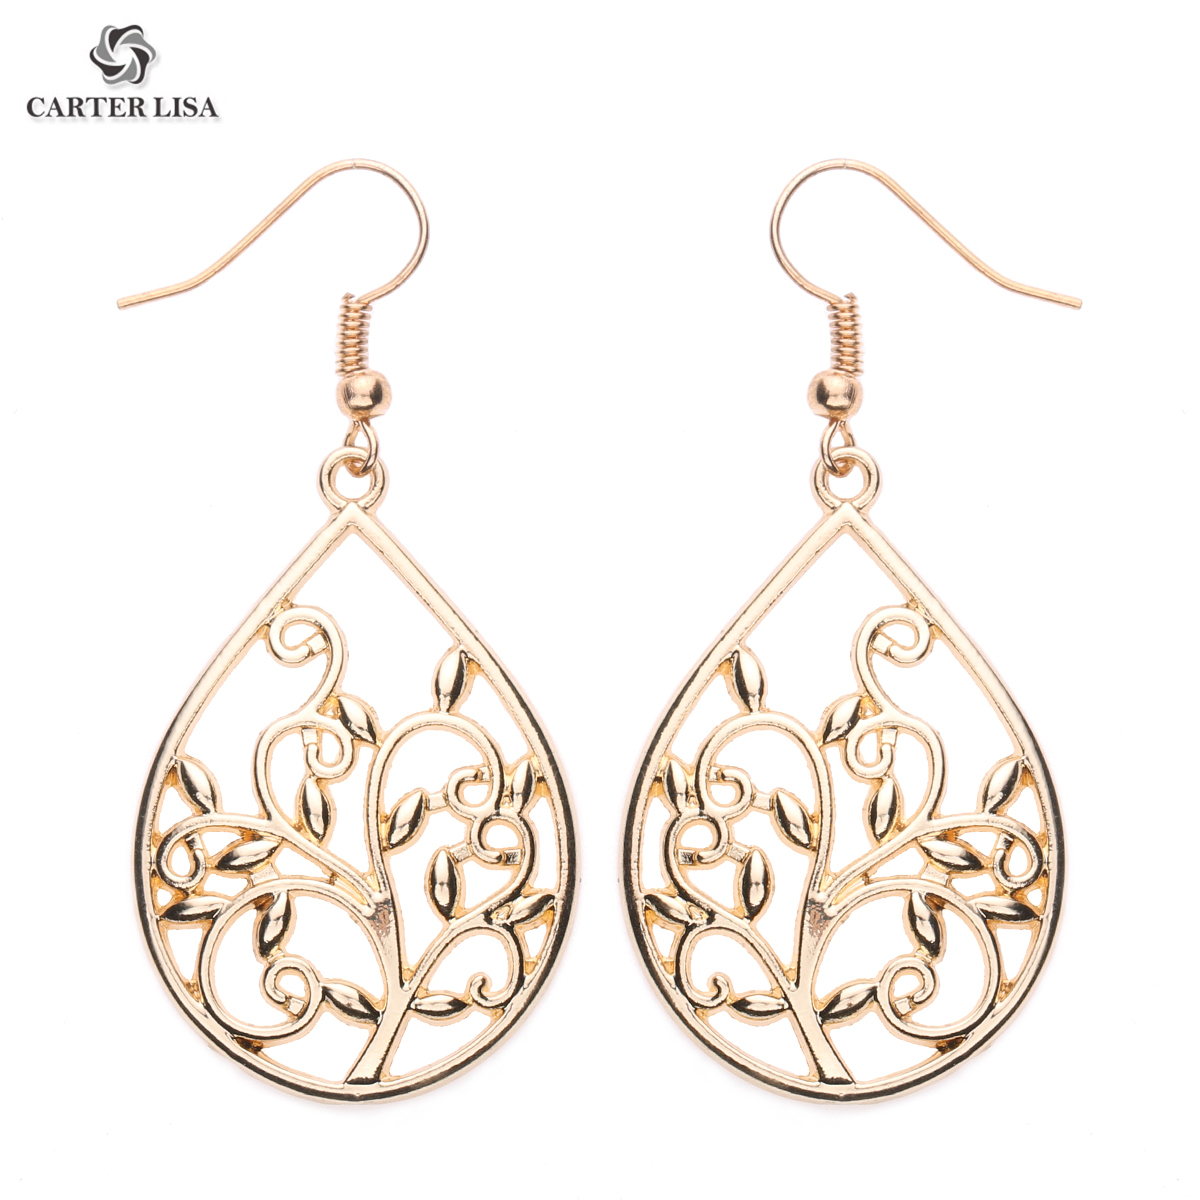 CARTER LISA 2019 New Fashion Earrings Three Of Life Personality Exaggerated Dangle Earrings  Teardrop Ethnic  Earrings HDEA-082